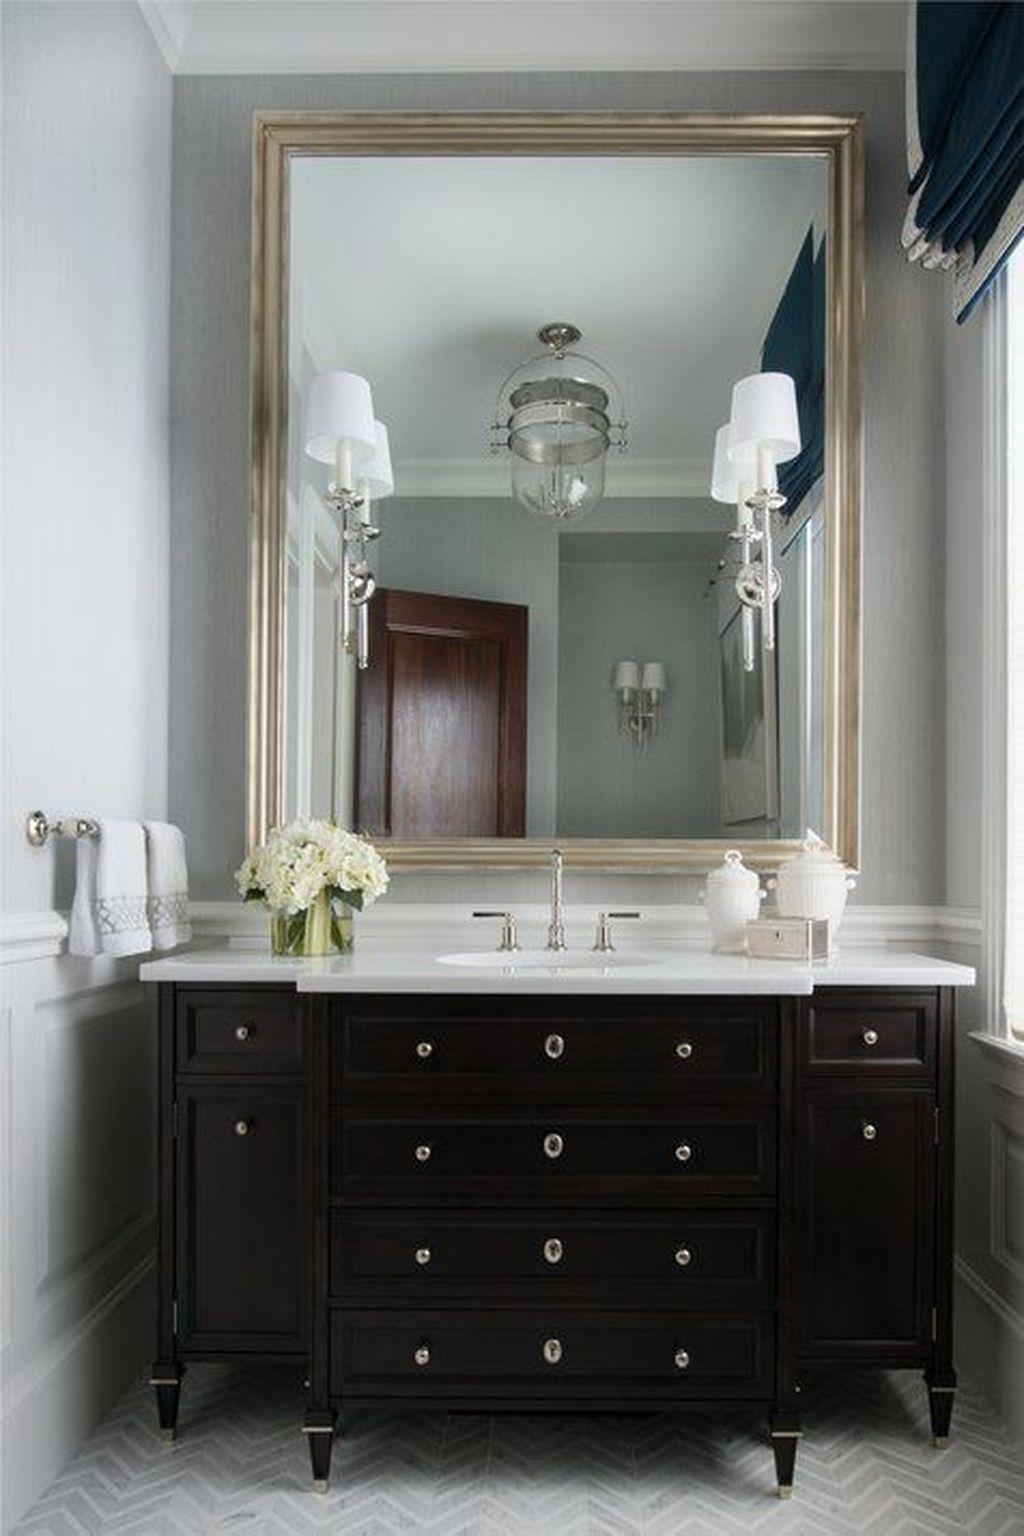 30 Best Traditional Bathroom Design Ideas For Room Bathroom Traditional Bathroom Bathroom Bathroom Design Inspiration